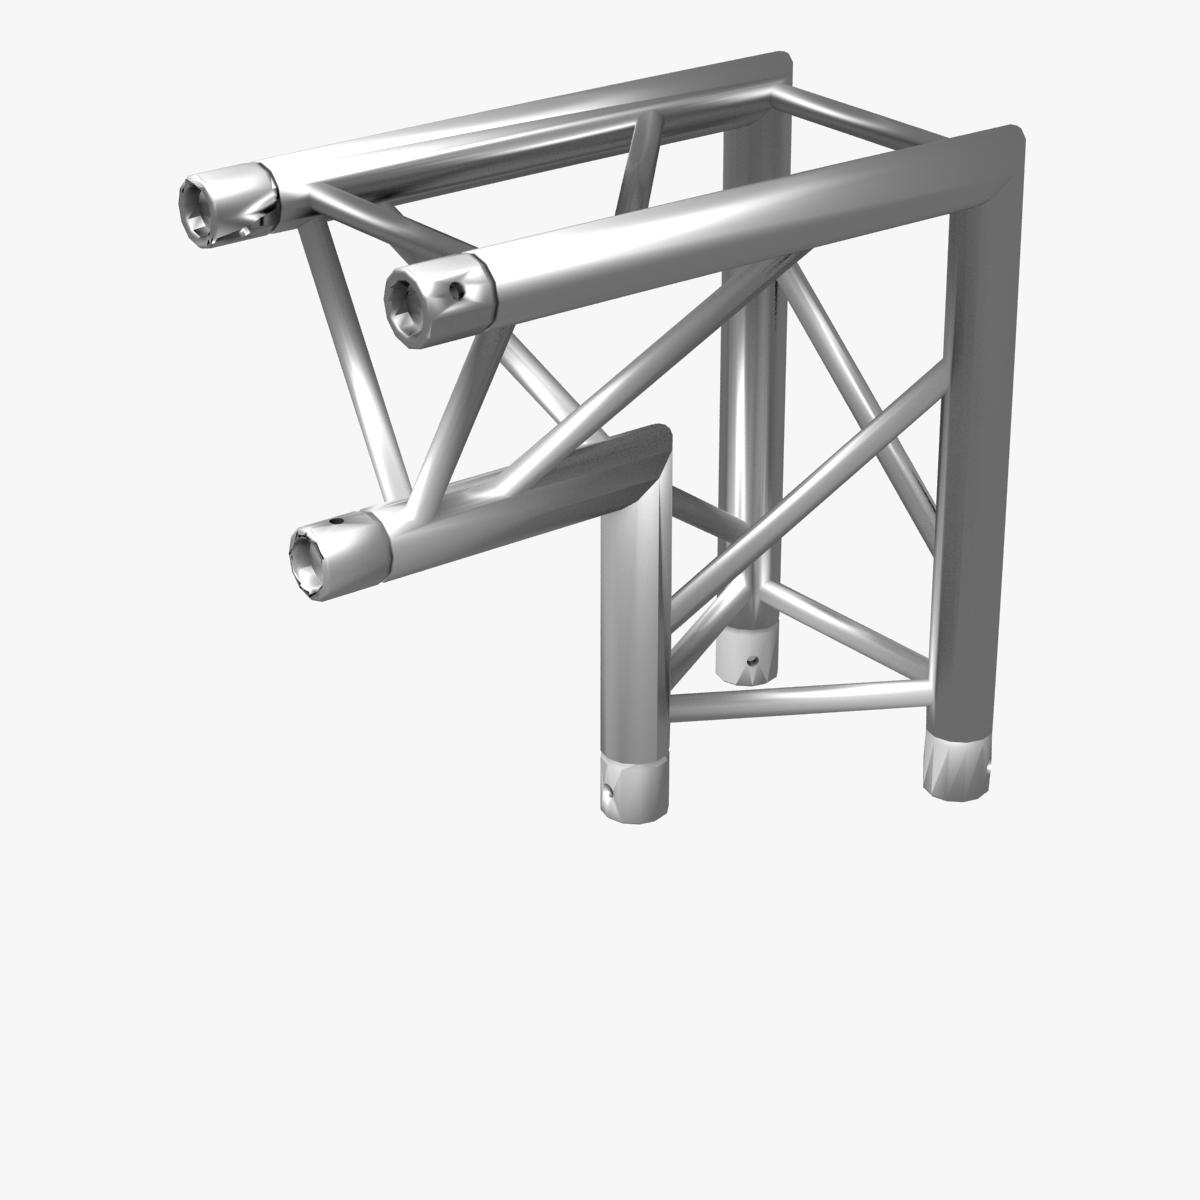 triangular trusses (collection 55 modular pieces) 3d model 3ds max dxf fbx c4d dae texture obj 216246